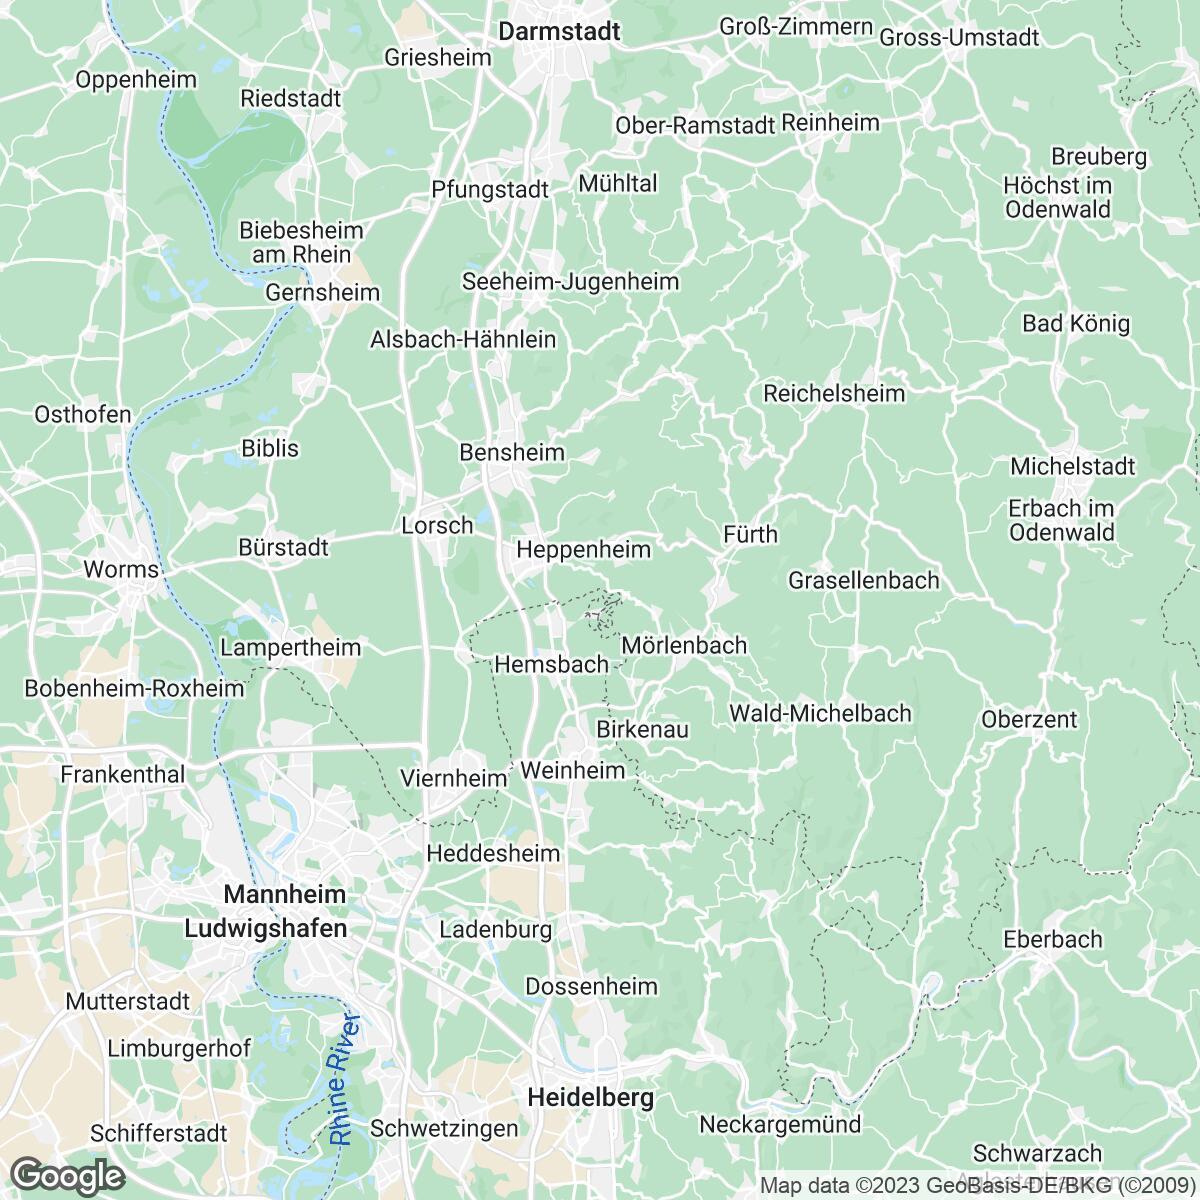 Verkaufsgebiet der Zeitungen Rhein-Neckar-Zeitung